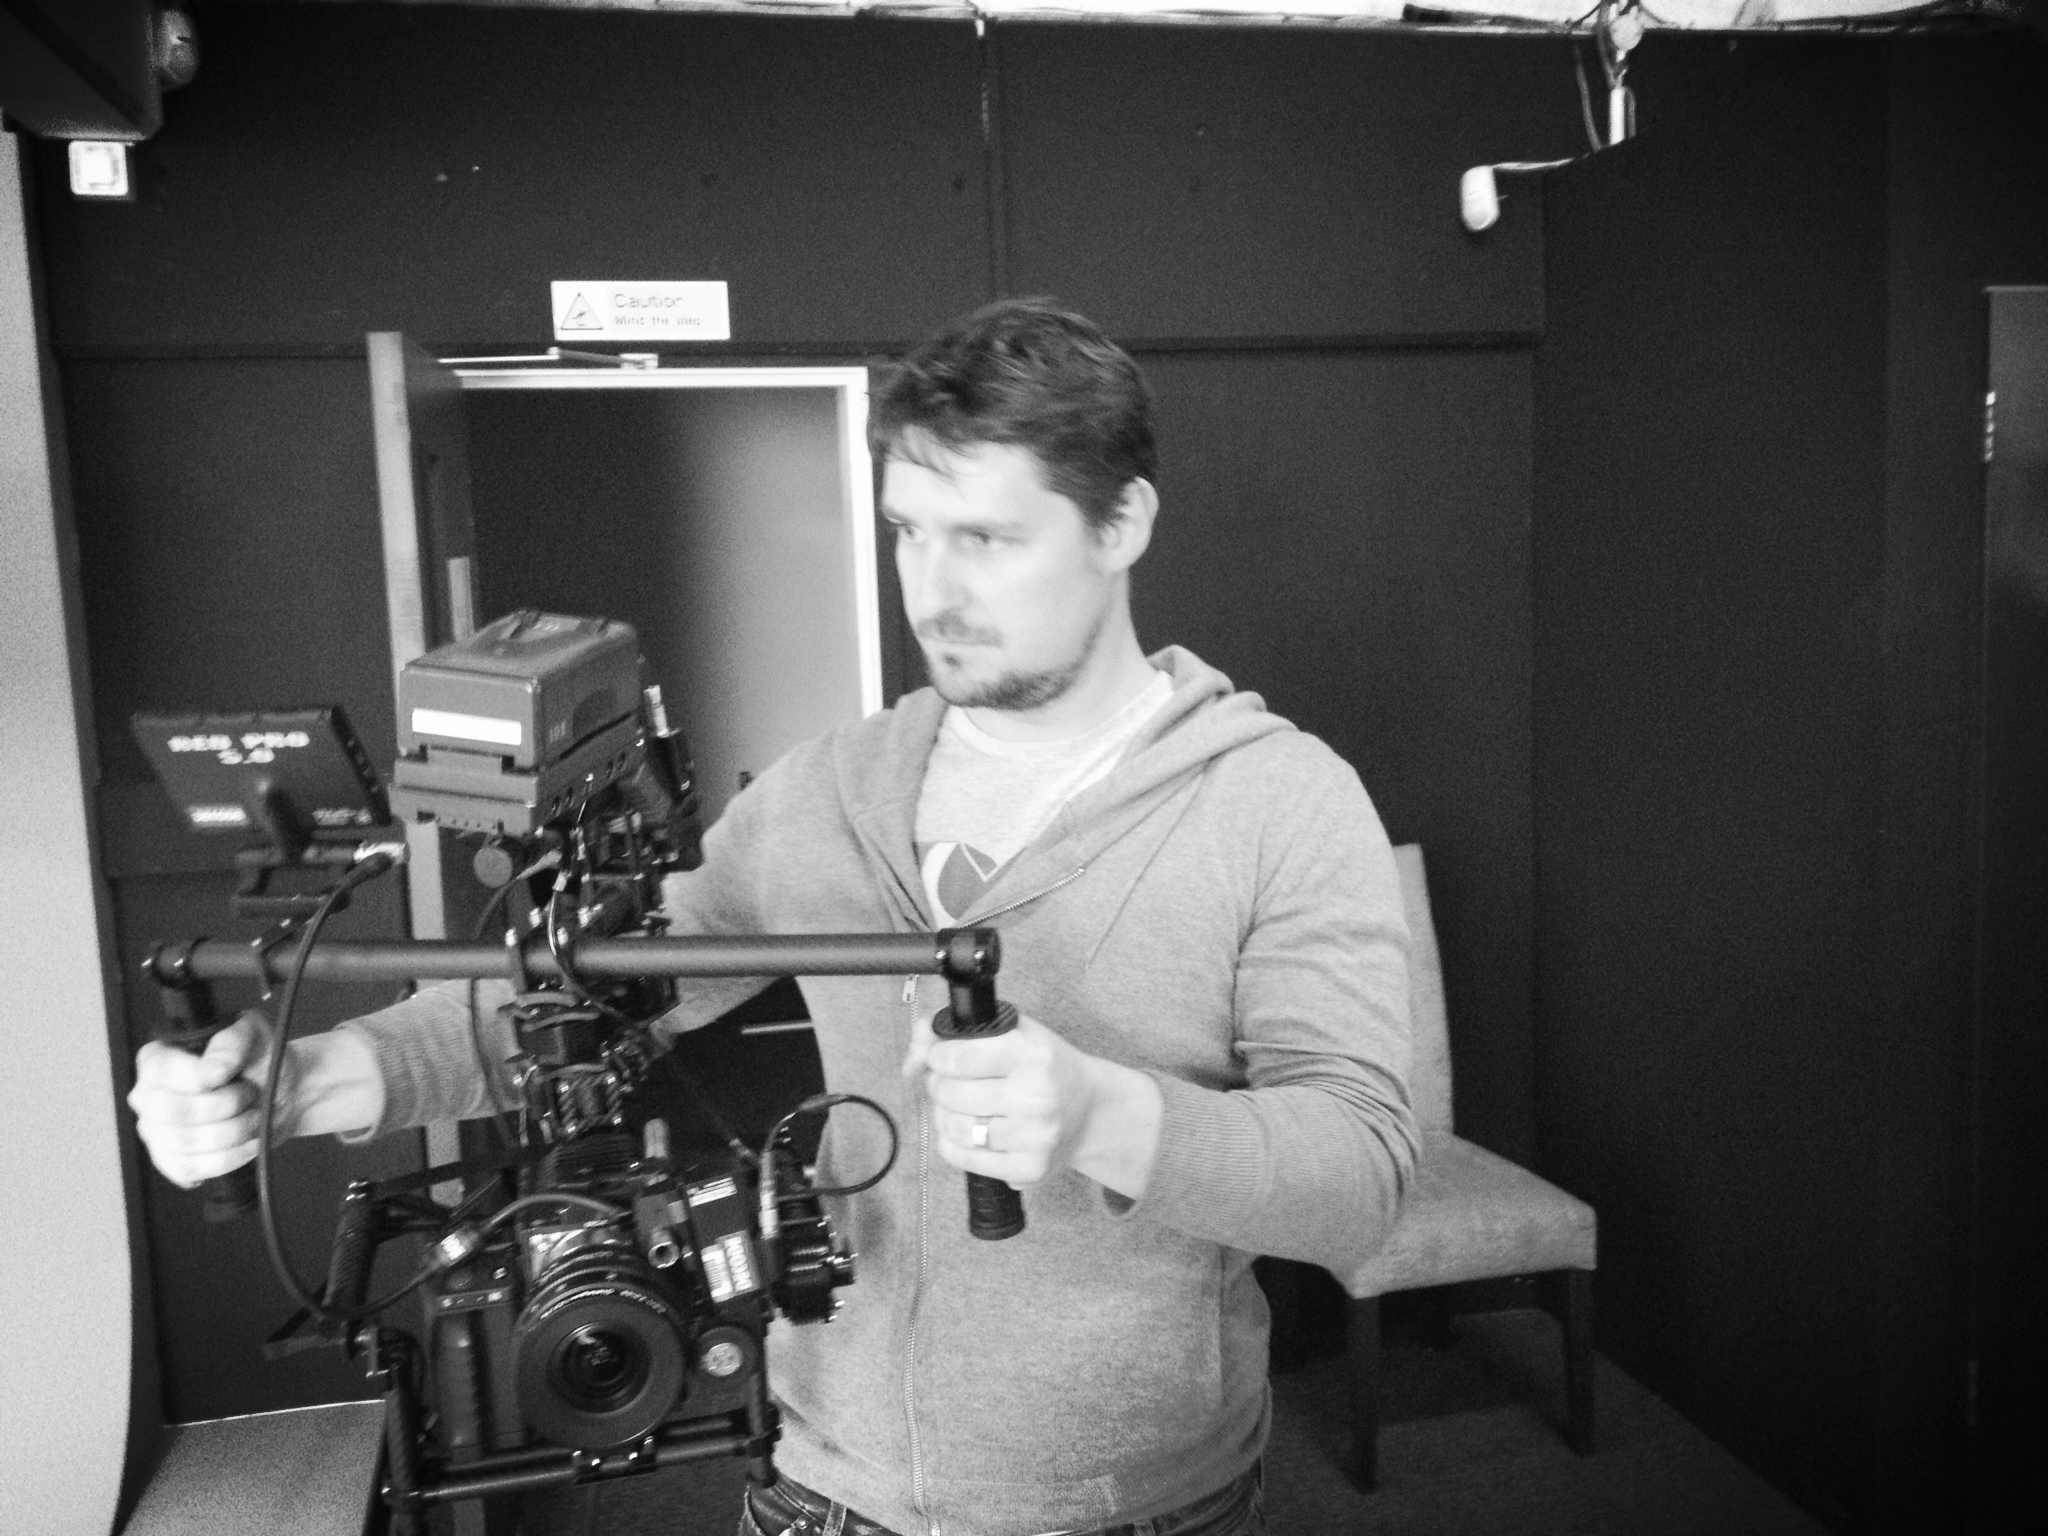 Movi 10 Test - Richard Cornelius - Steadicam Operator